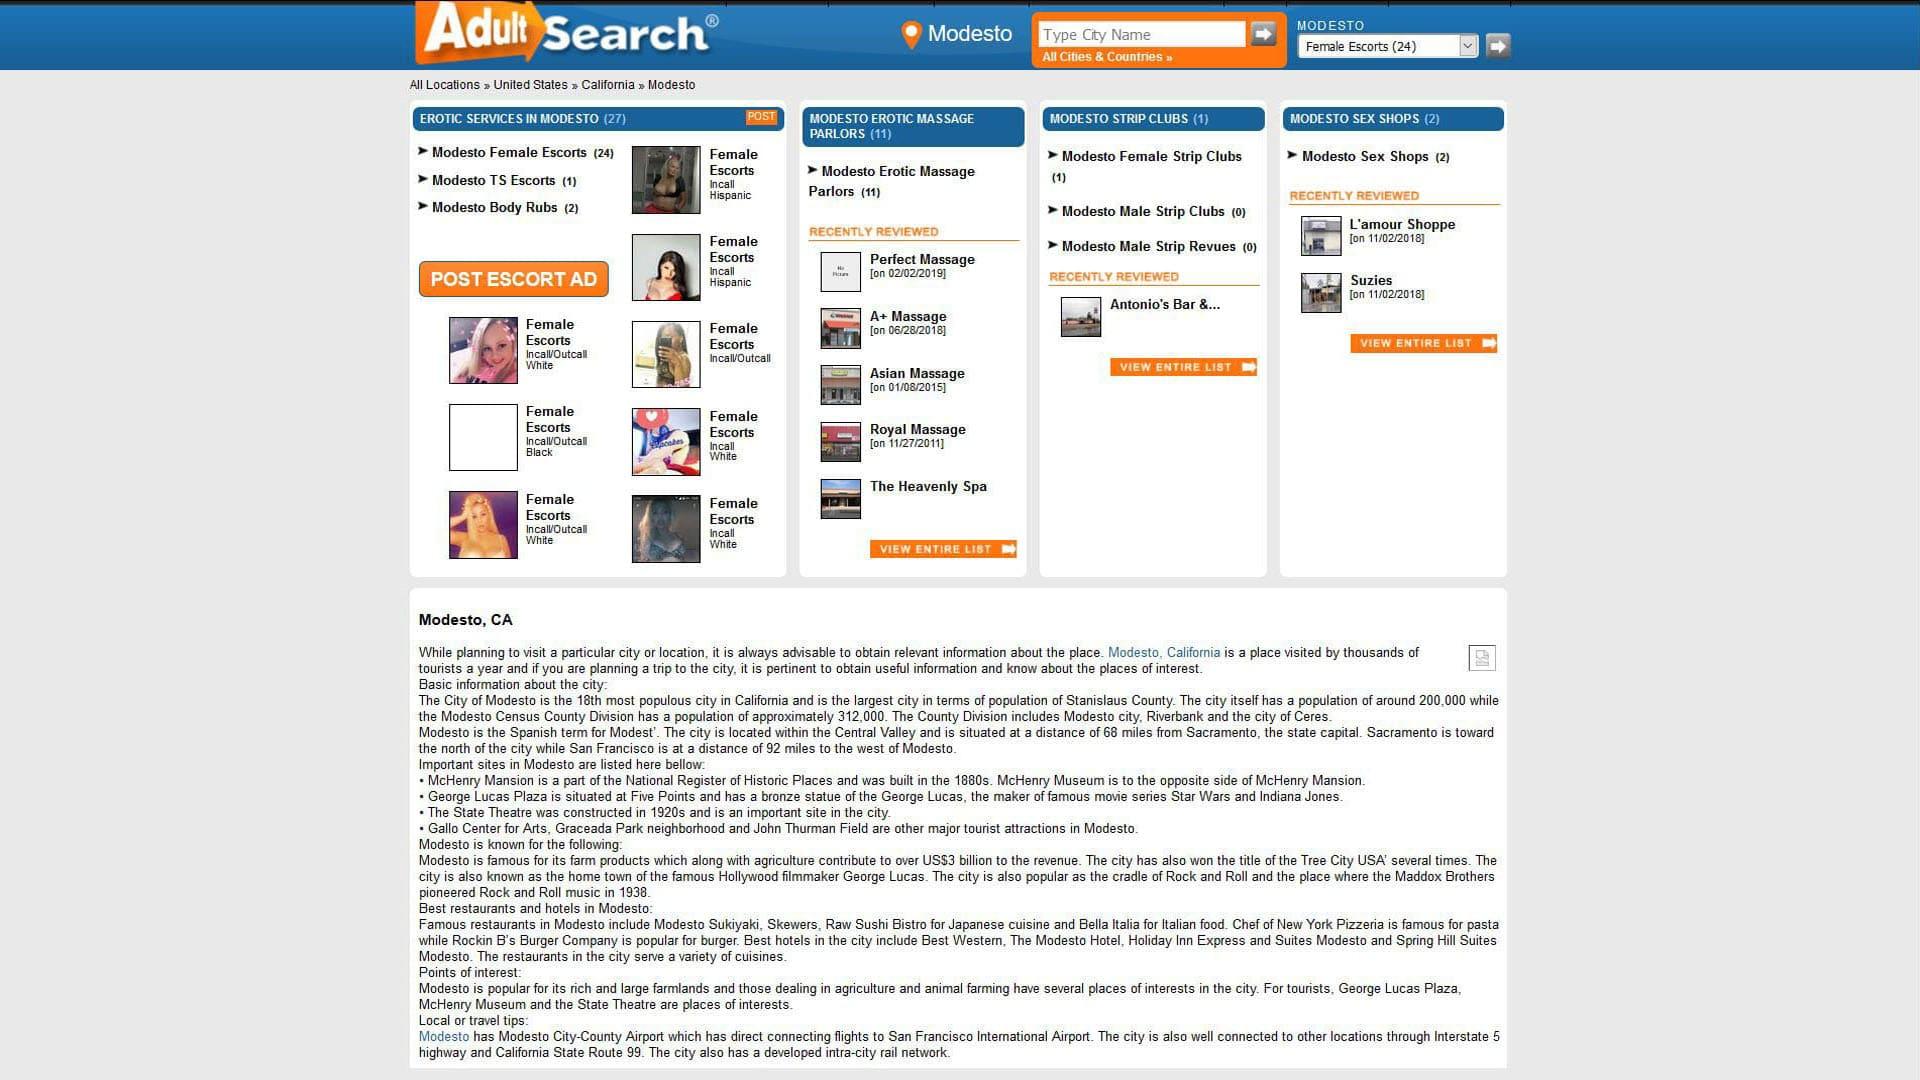 AdultSearch Modesto California